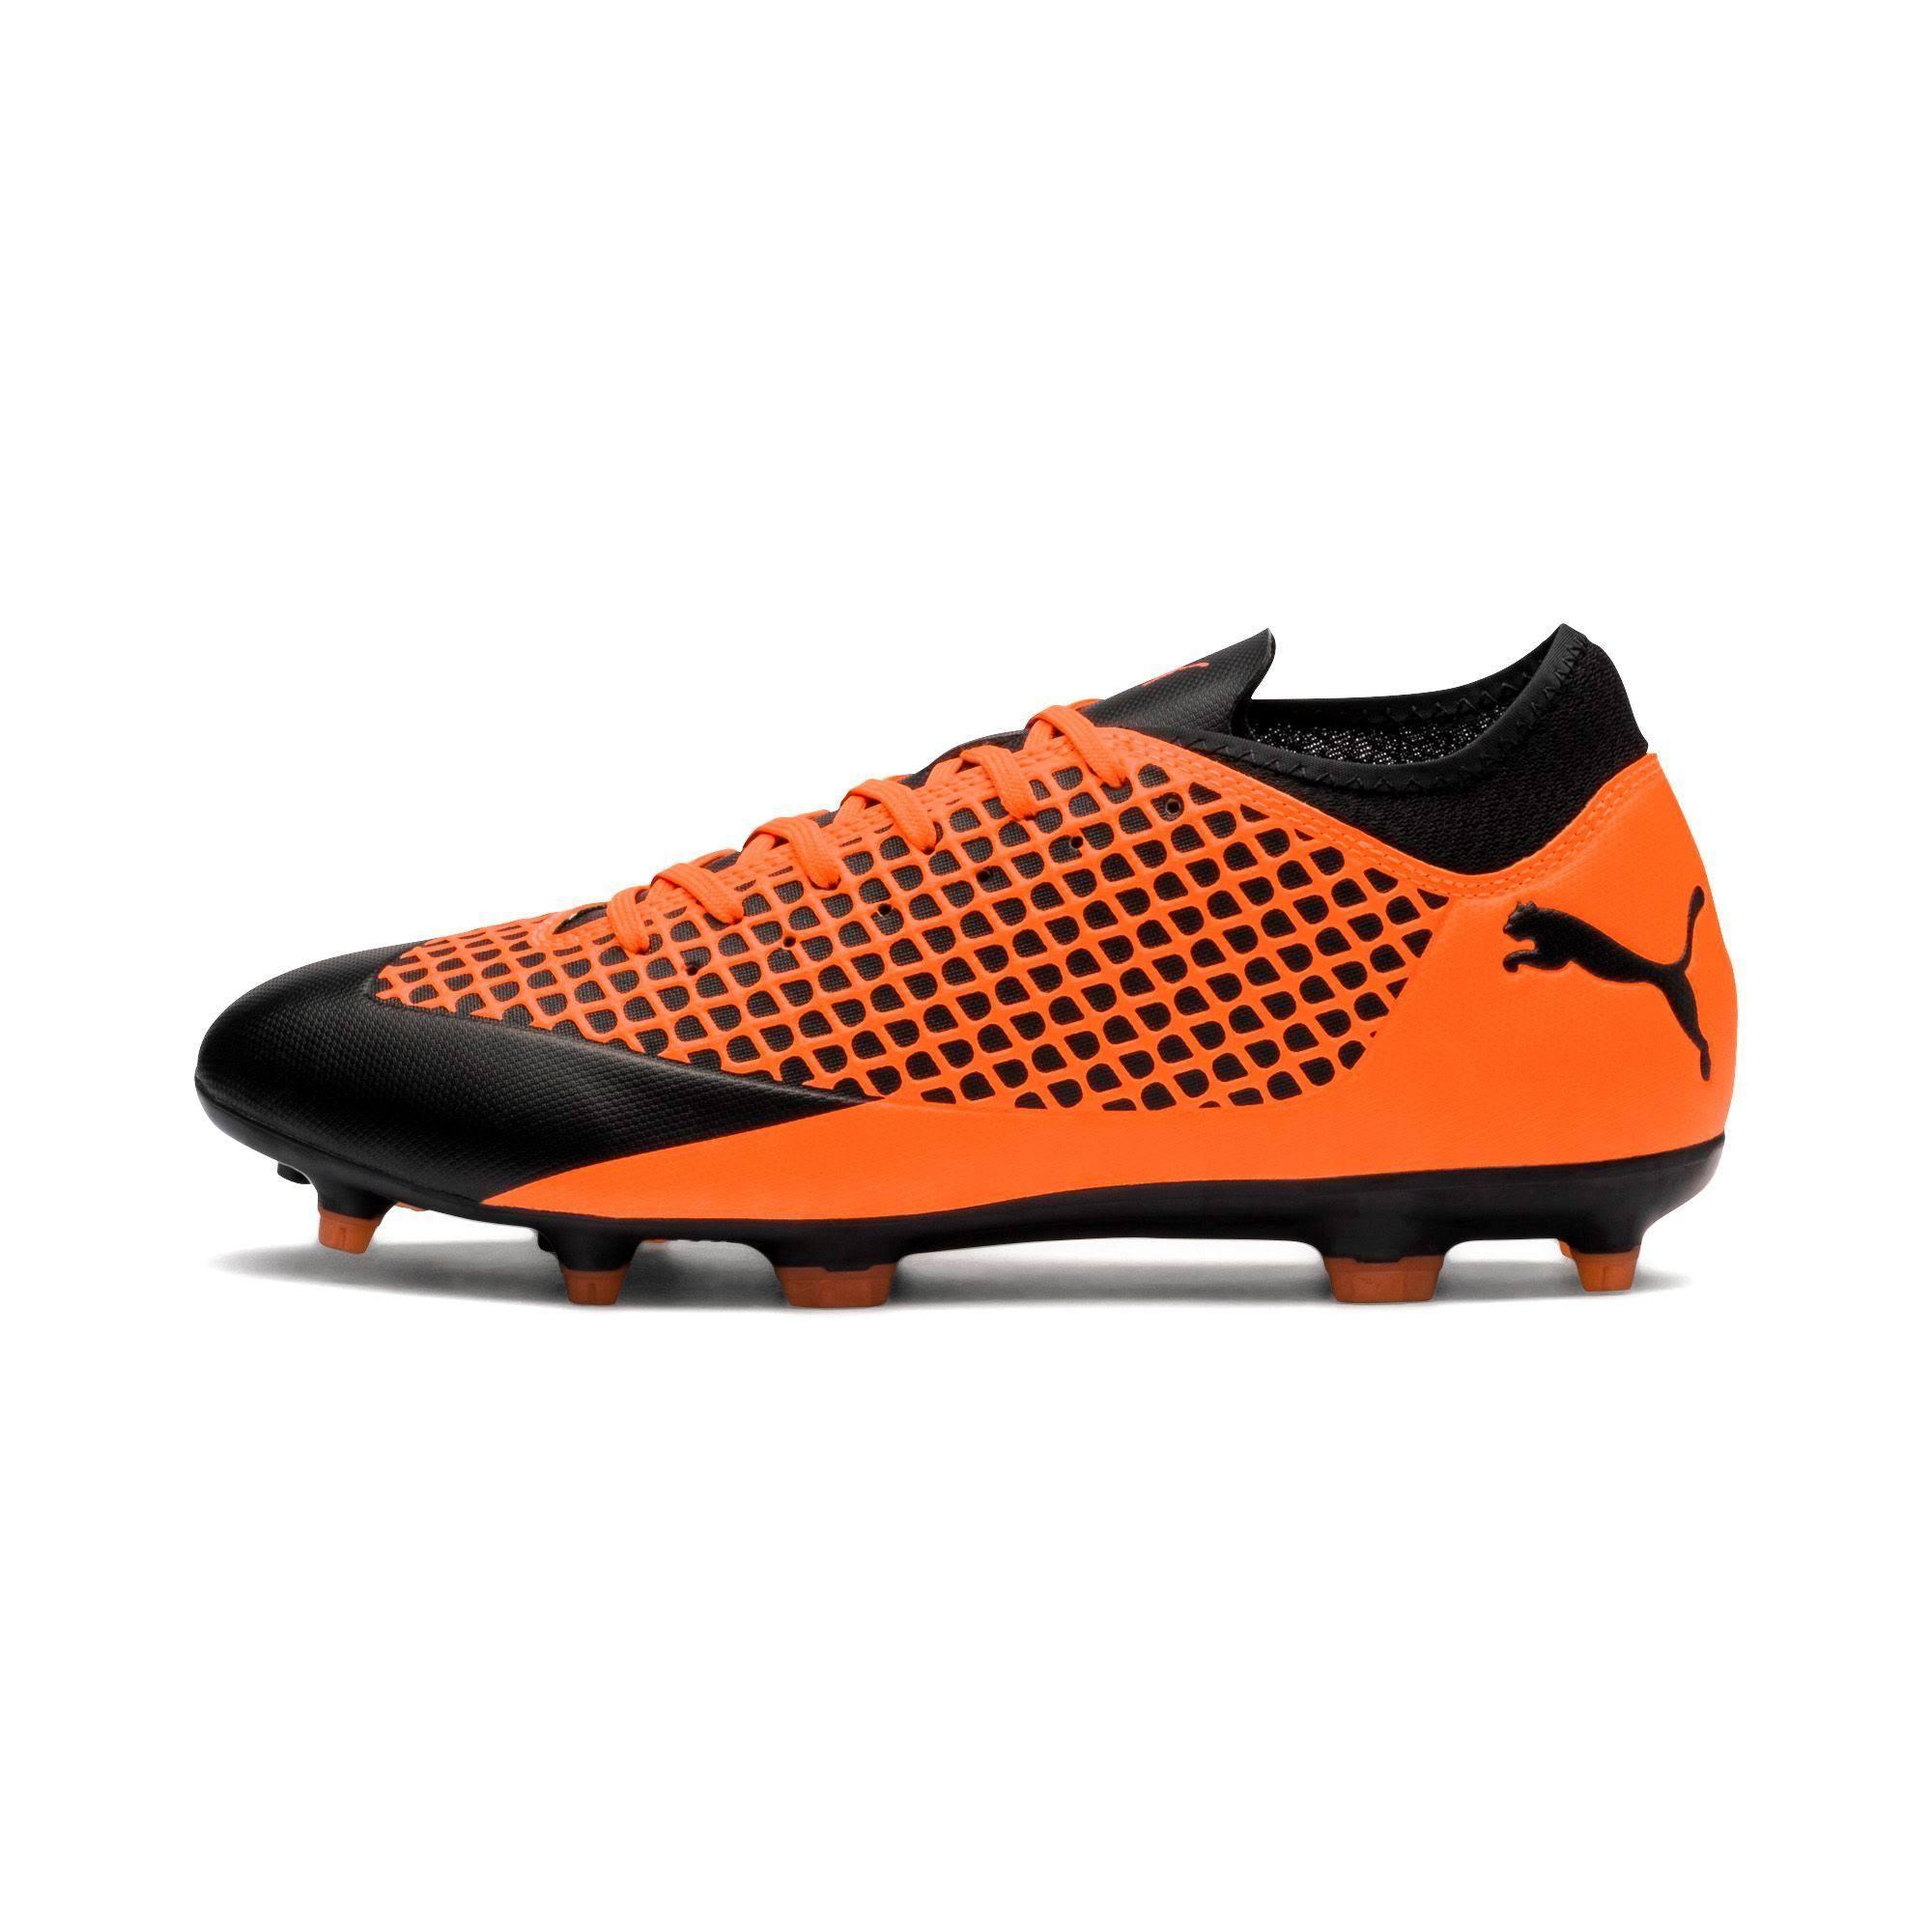 Puma Orange Soccer Bodenschuhe 2 104839 Shockingorange 4 02 In Feste Pumablack Future HTHrS